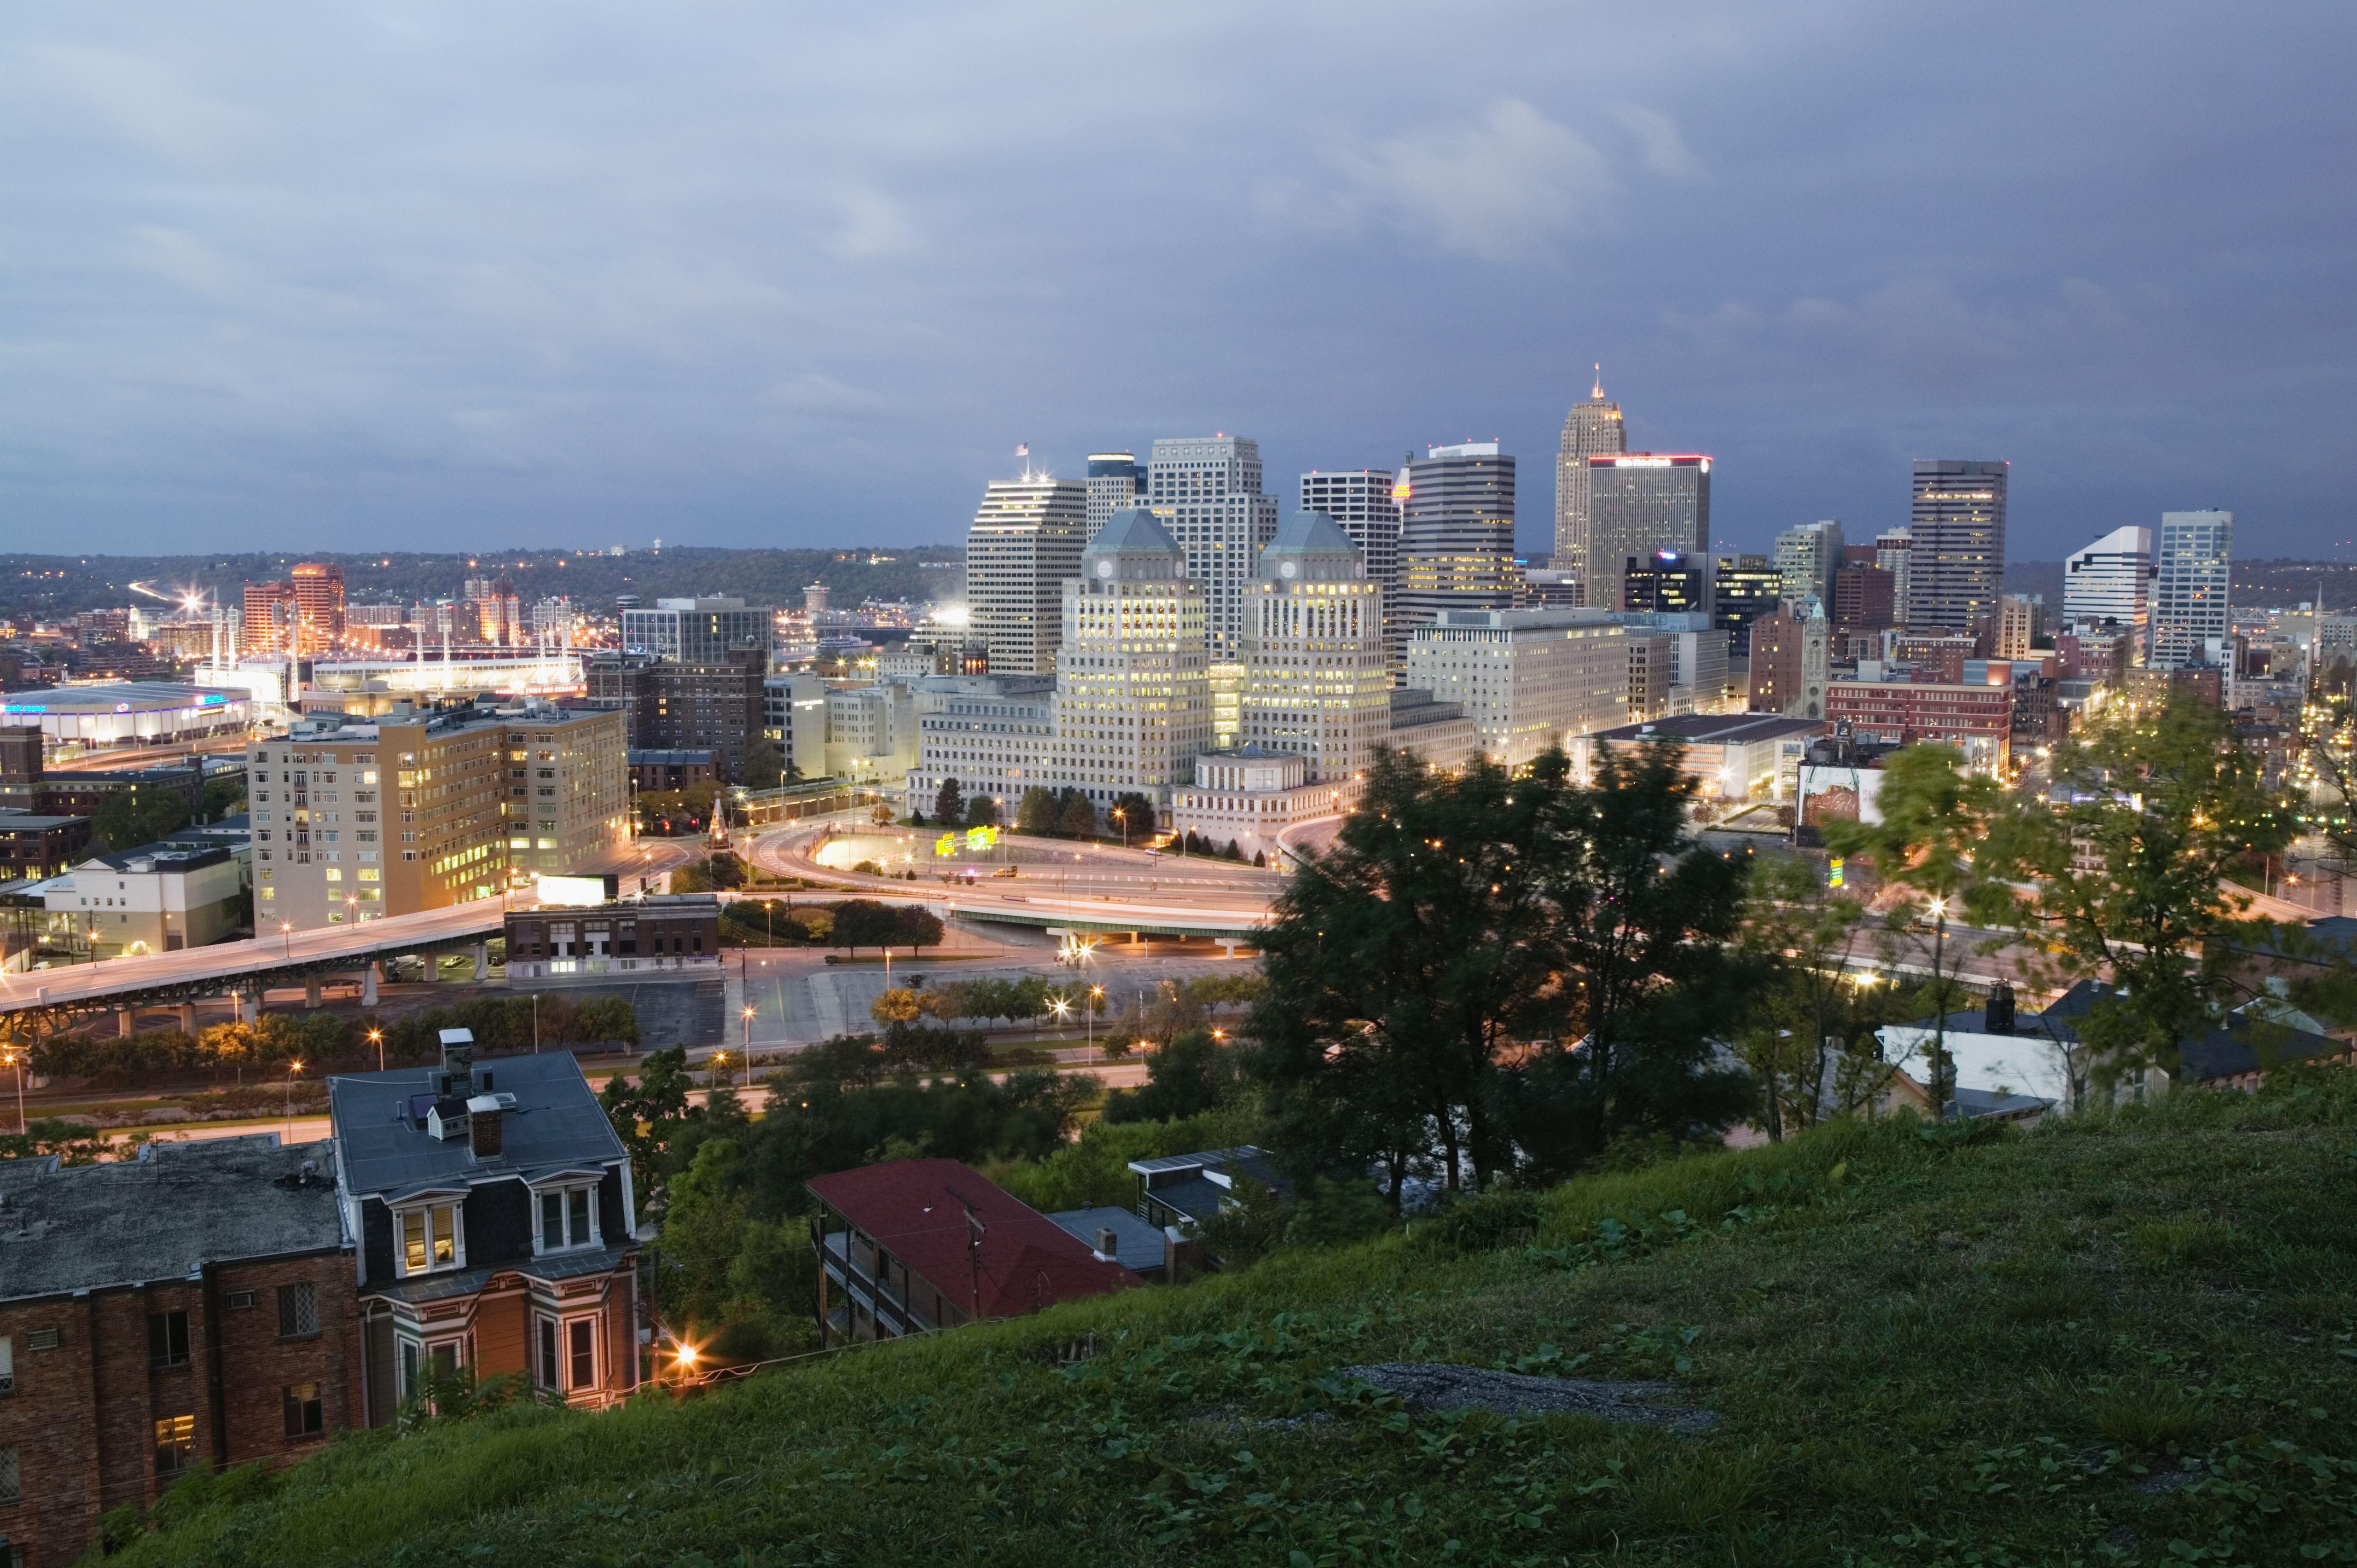 Free Things to Do in Cincinnati, Ohio